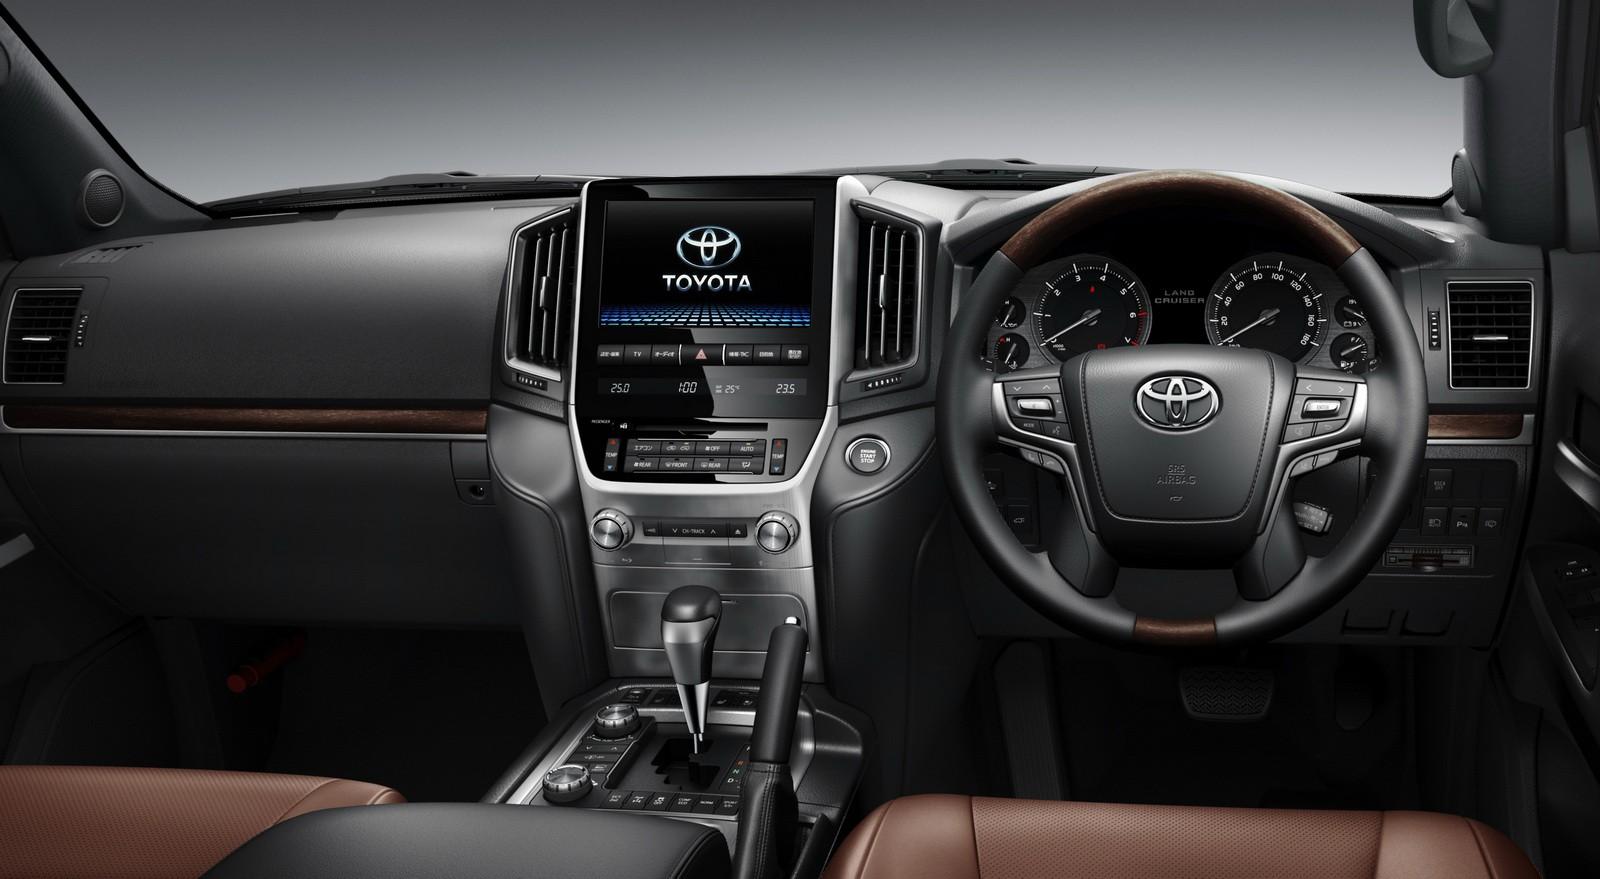 Toyota Land Cruiser 200 facelift Toyota Land Cruiser 200 facelift ...